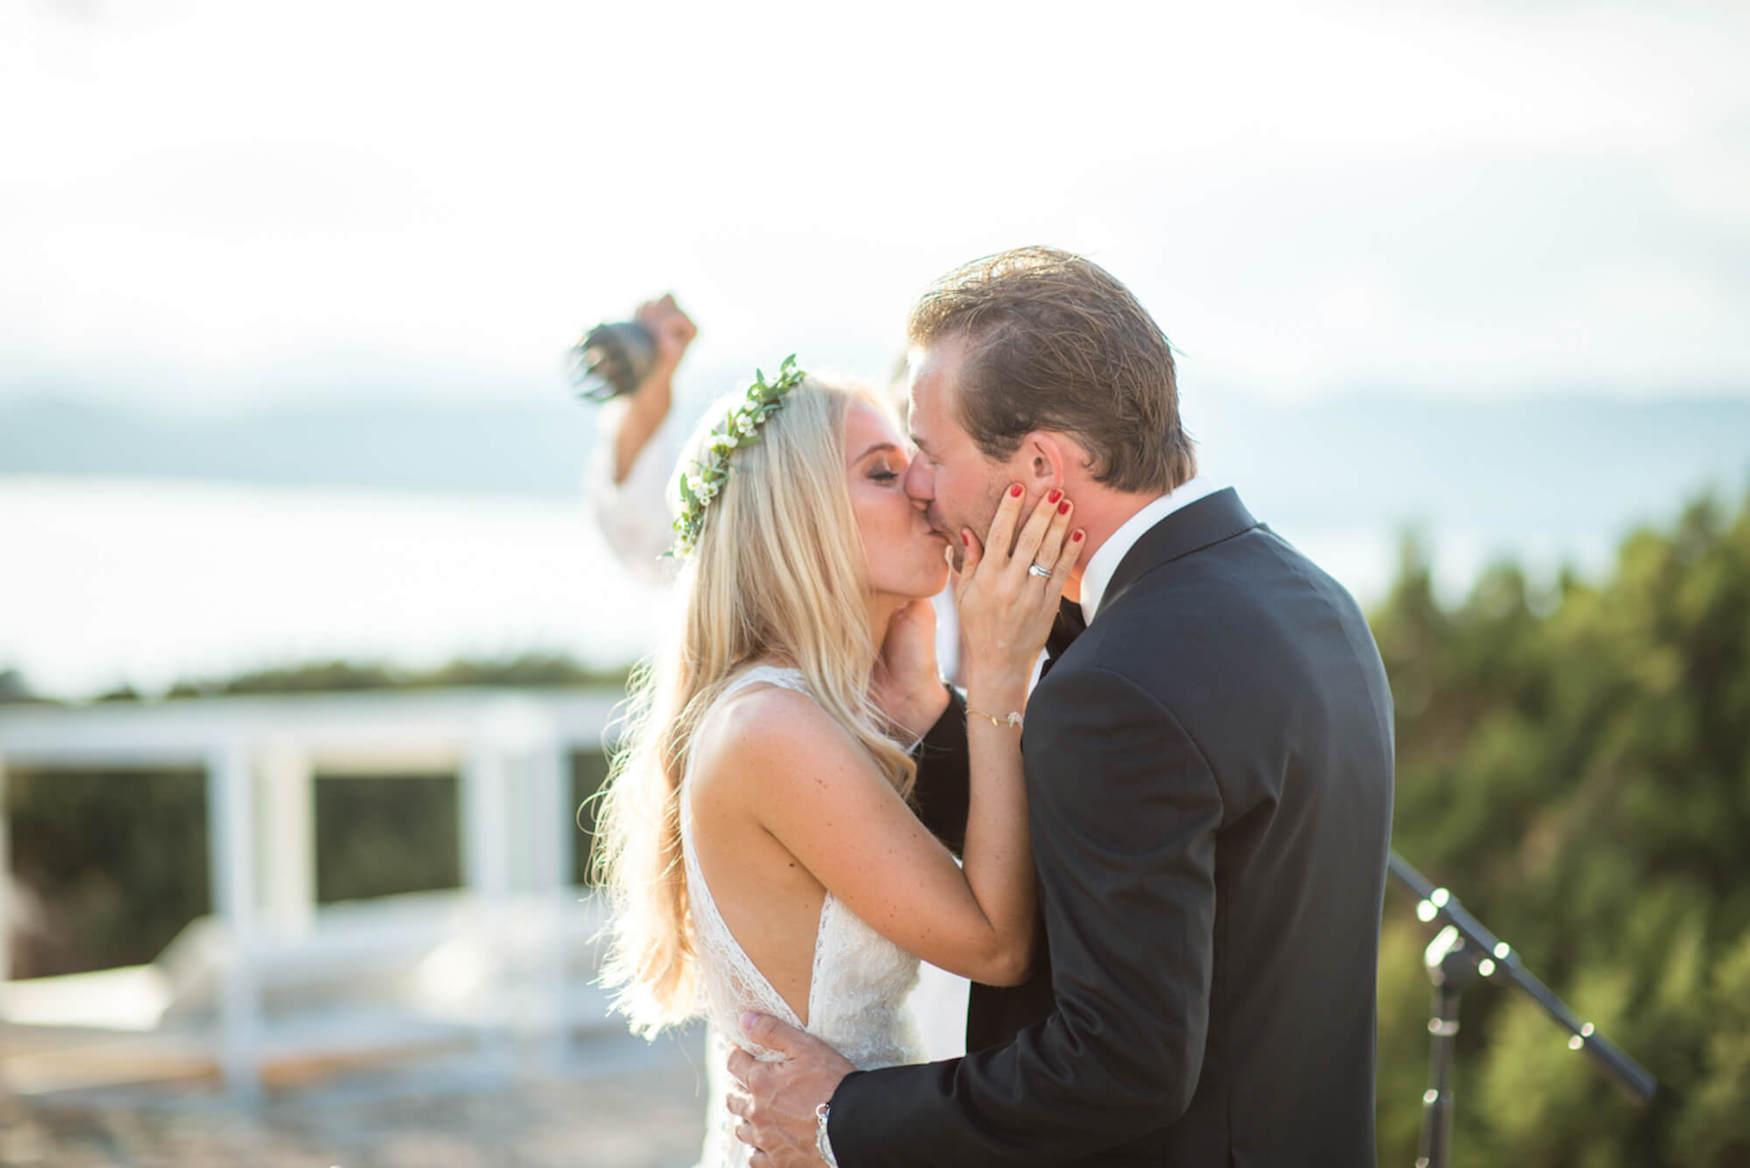 bride groom sunset kiss ceremony black tie flower crown pronovias dress